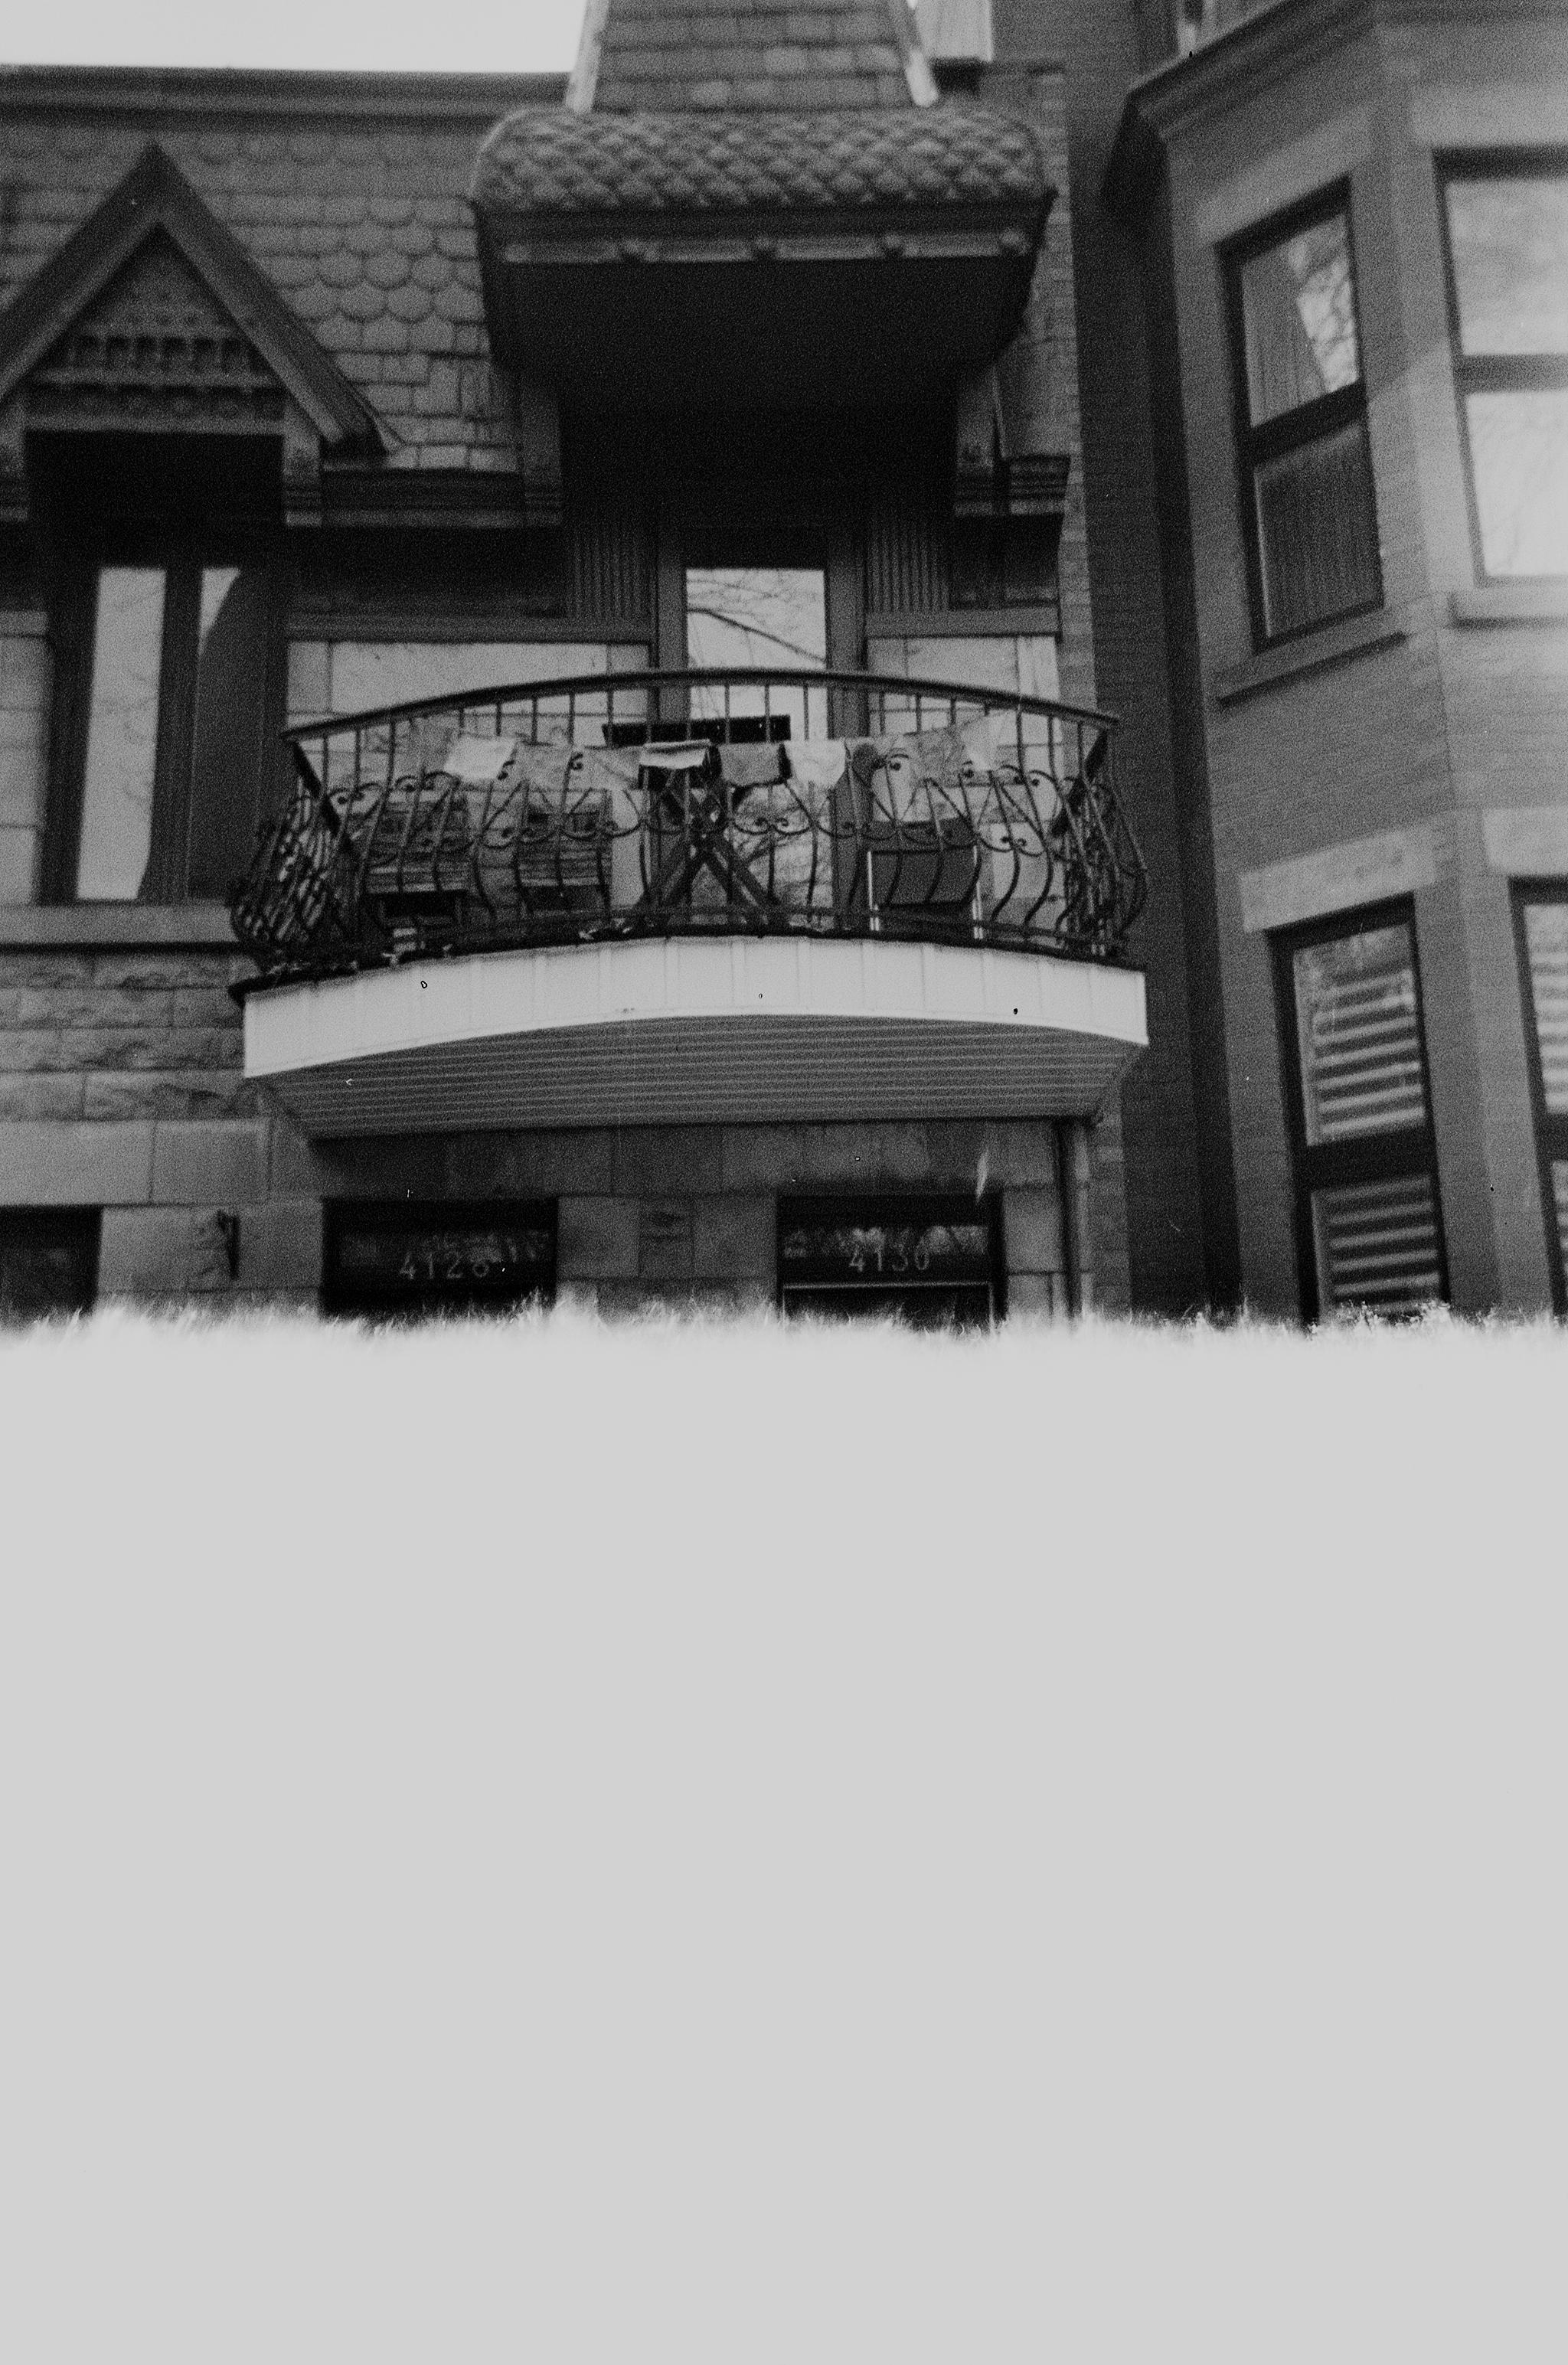 WAV CAV - Airbnb from Fall 2017 - Ilford XP2